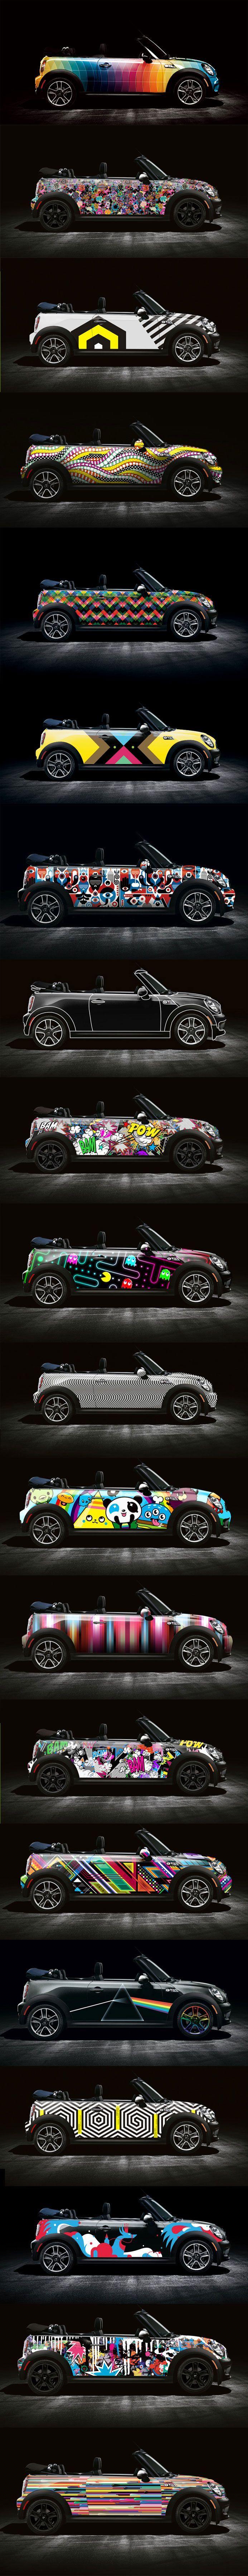 Nice Mini cooper  2017: Mini Cooper Cool Wraps ♥ App for Mini Cooper Warning Lights, is now in App Sto... Check more at http://24cars.top/2017/mini-cooper-2017-mini-cooper-cool-wraps-%e2%99%a5-app-for-mini-cooper-warning-lights-is-now-in-app-sto/